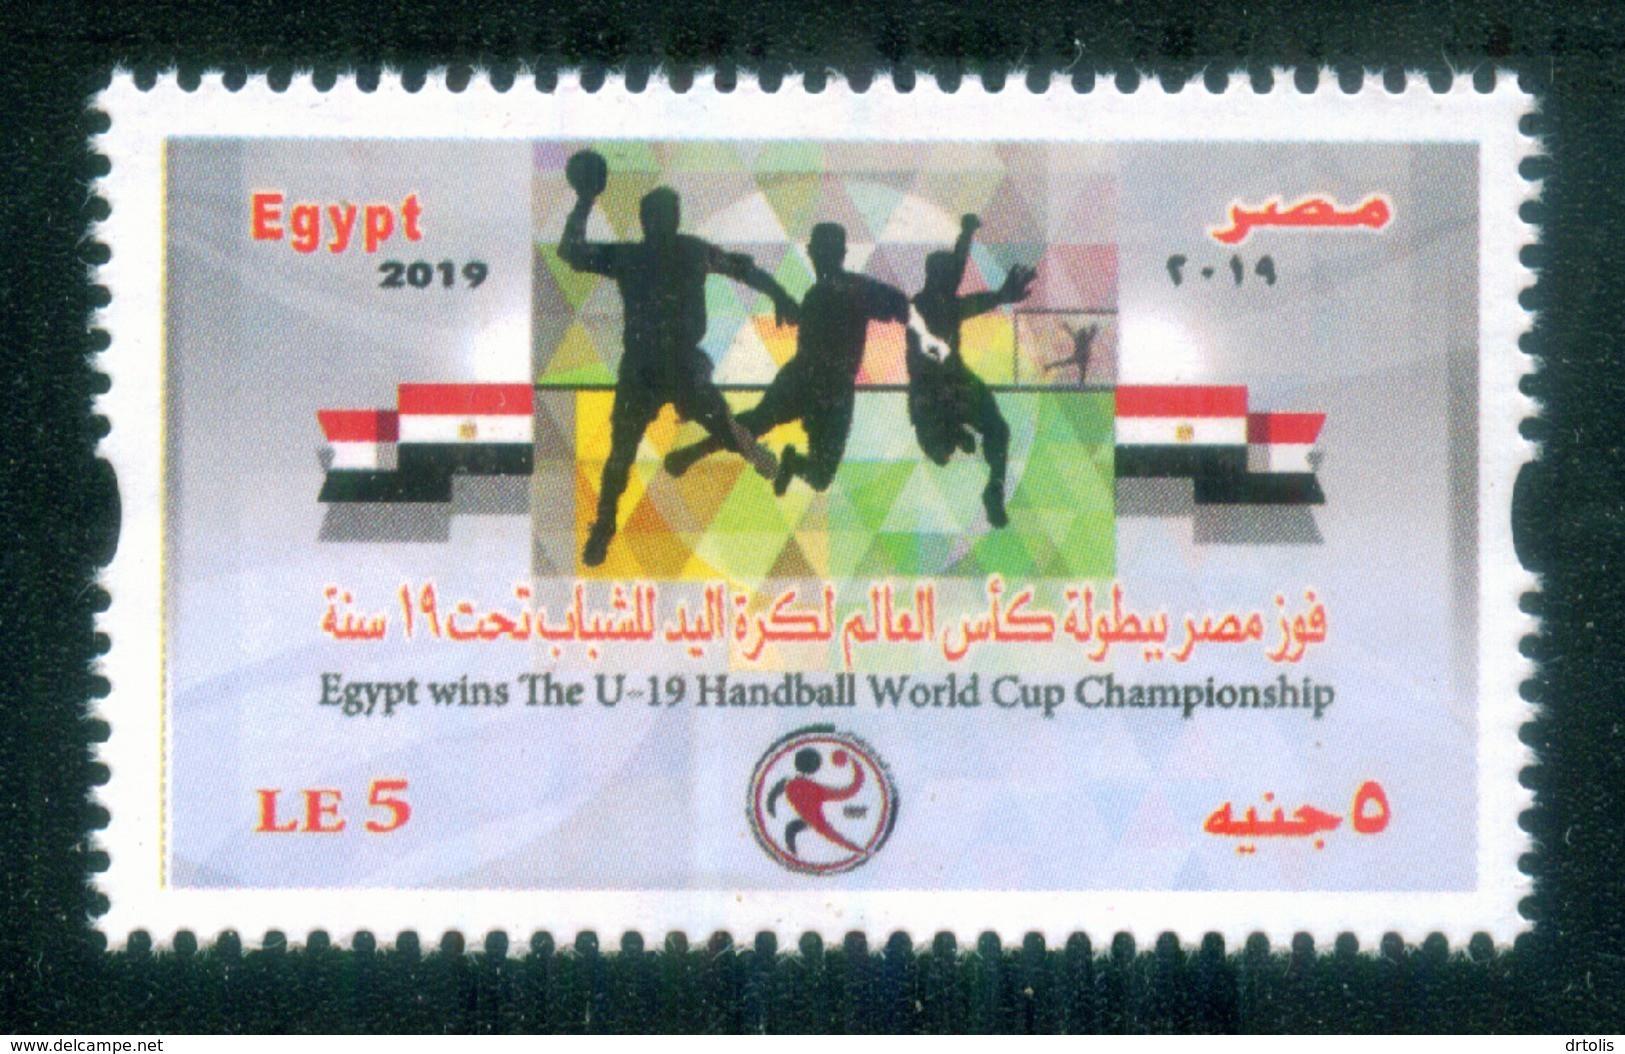 EGYPT / NORTH MACEDONIA / 2019 / SPORT / HANDBALL / U-19 HANDBALL WORLD CUP CHAMPIONSHIP / MNH / VF - Nuovi